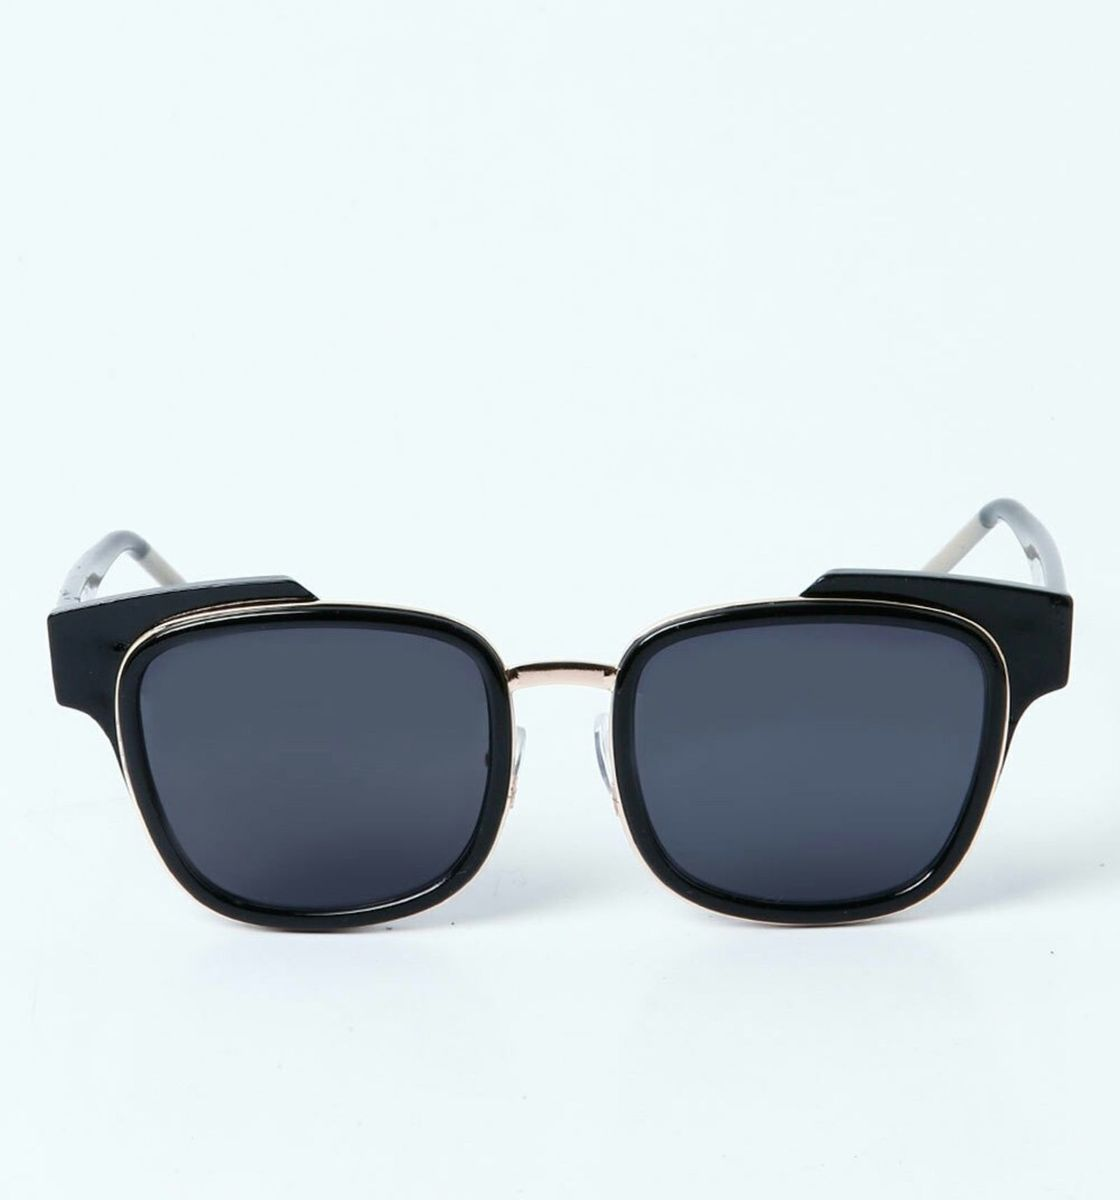 94a1f31bc2dcb oculos de sol marisa - óculos marisa.  Czm6ly9wag90b3muzw5qb2vplmnvbs5ici9wcm9kdwn0cy8zotm2ntivmgrjnte2y2qwyjhmzgq5odlimwrhntjjnja4ndg3zwyuanbn  ...